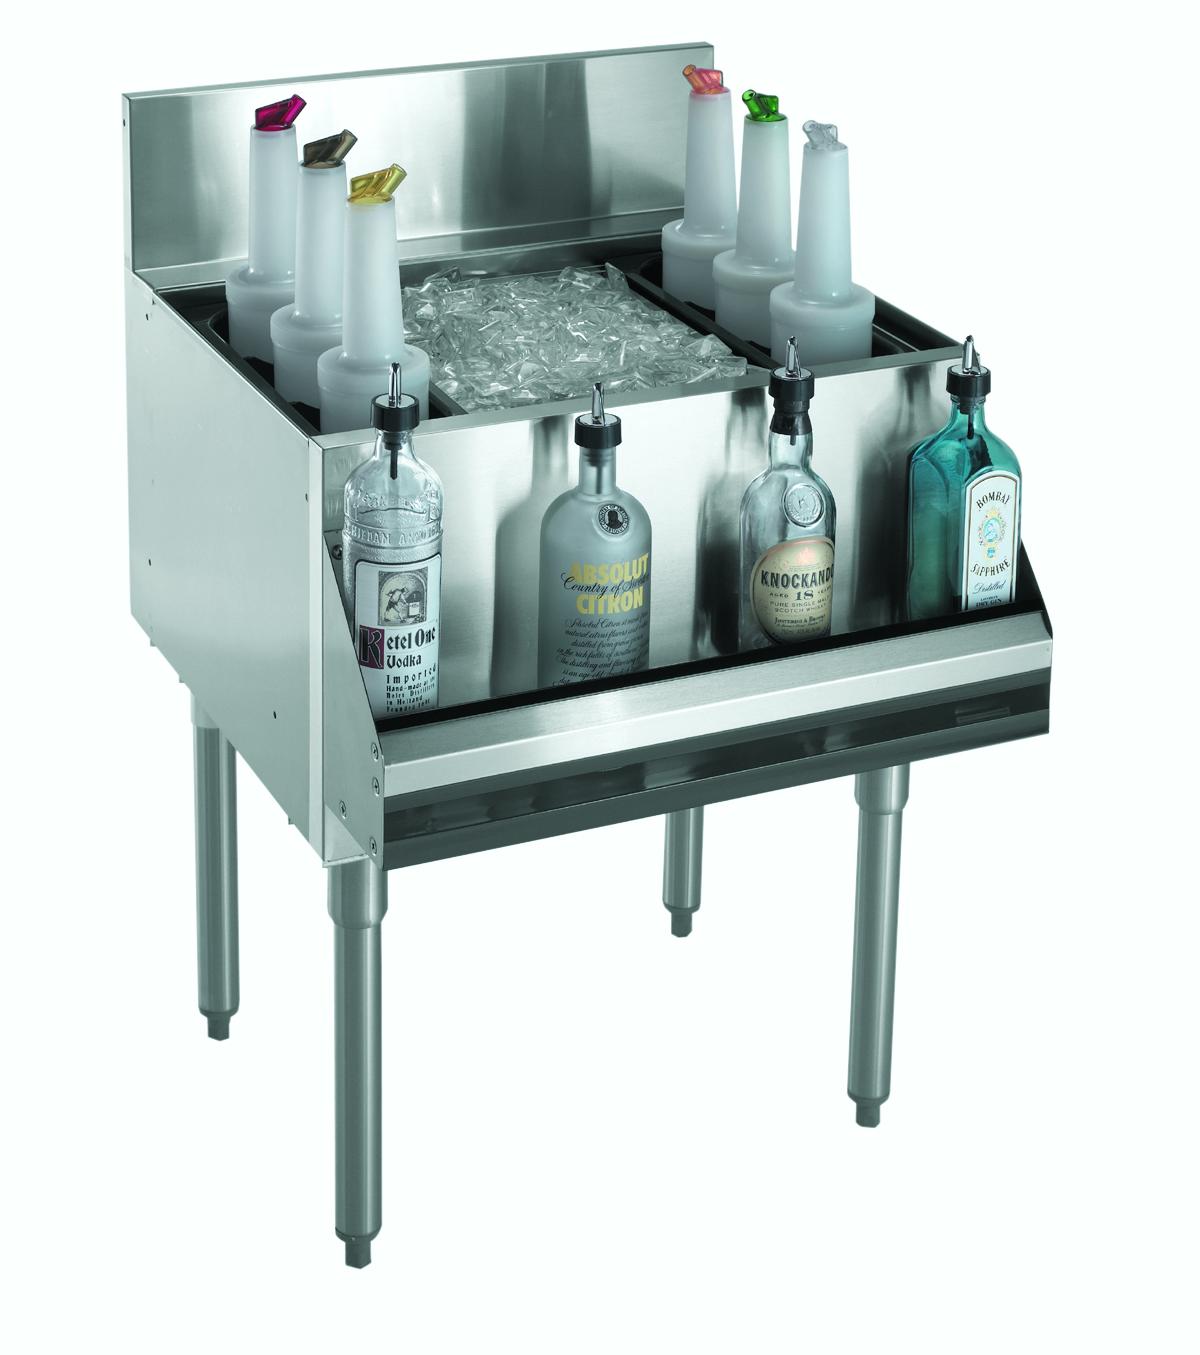 Krowne Metal KR21-24DP-10 underbar ice bin/cocktail unit